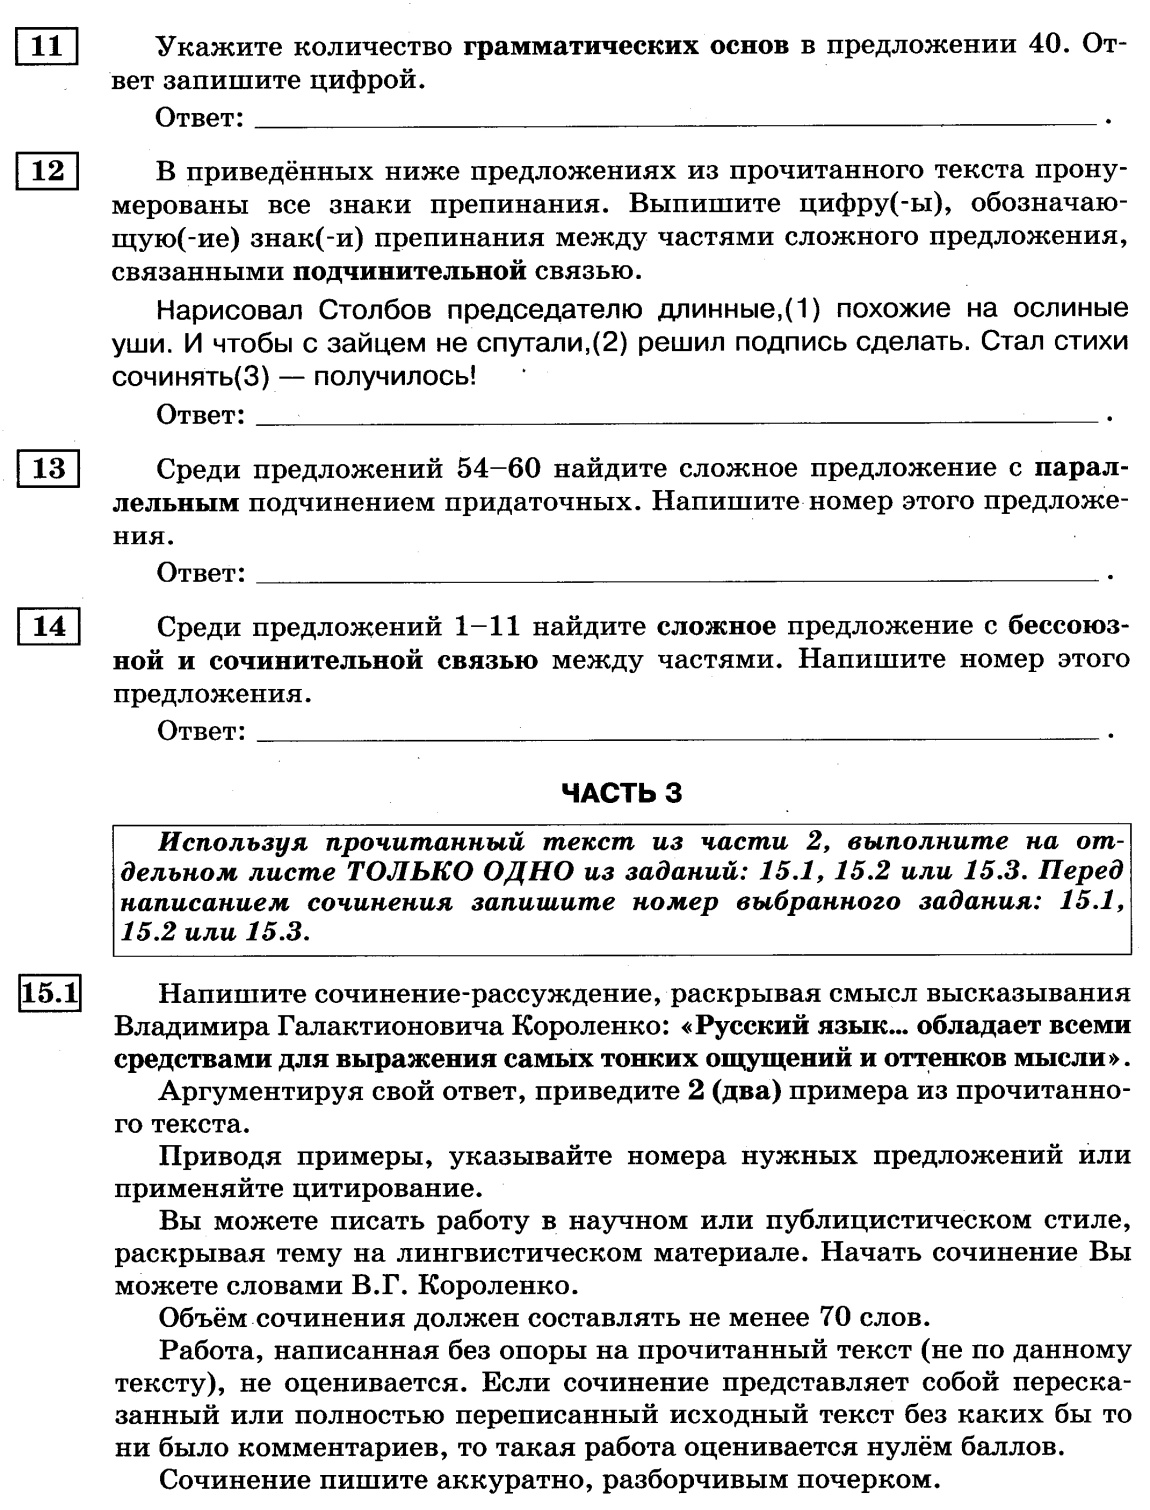 C:\Documents and Settings\Наташа\Рабочий стол\ОГЭ 2016\КИМы Степановой ОГЭ-2016\img297.jpg